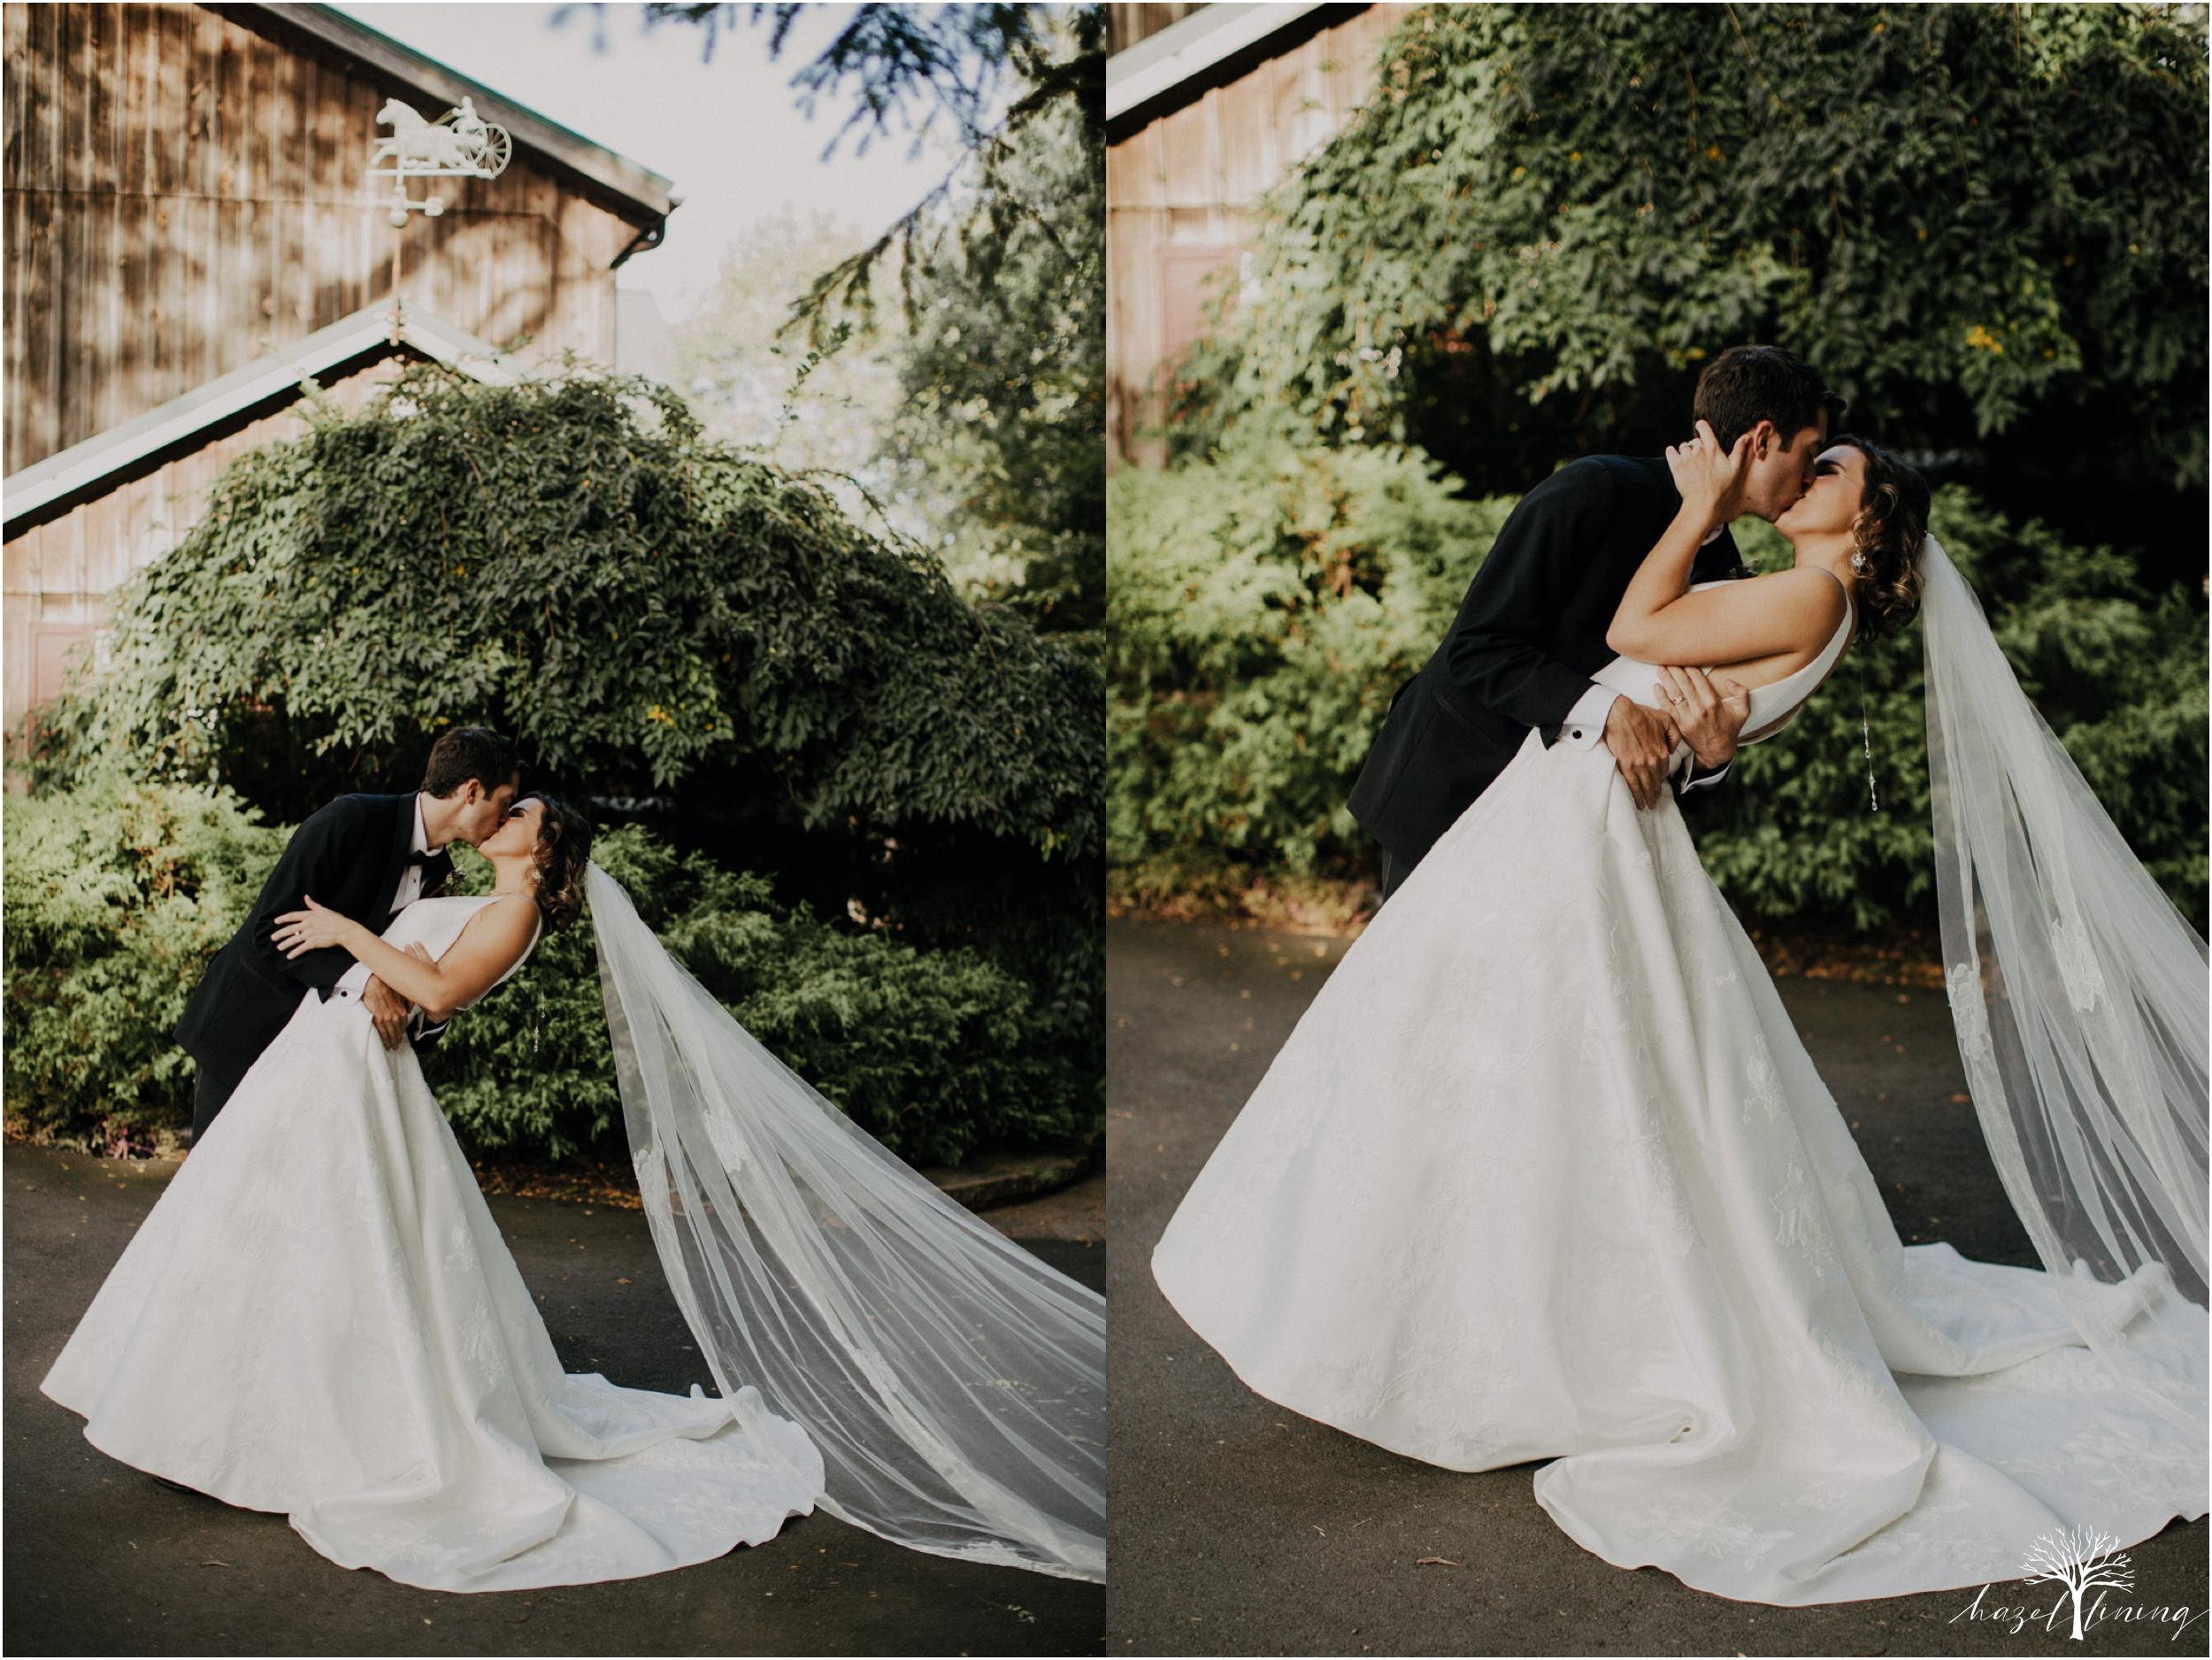 maureen-hepner-anthony-giordano-rose-bank-winery-newtow-pennsylvania-luxury-summer-wedding-hazel-lining-photography-destination-elopement-wedding-engagement-photography_0107.jpg